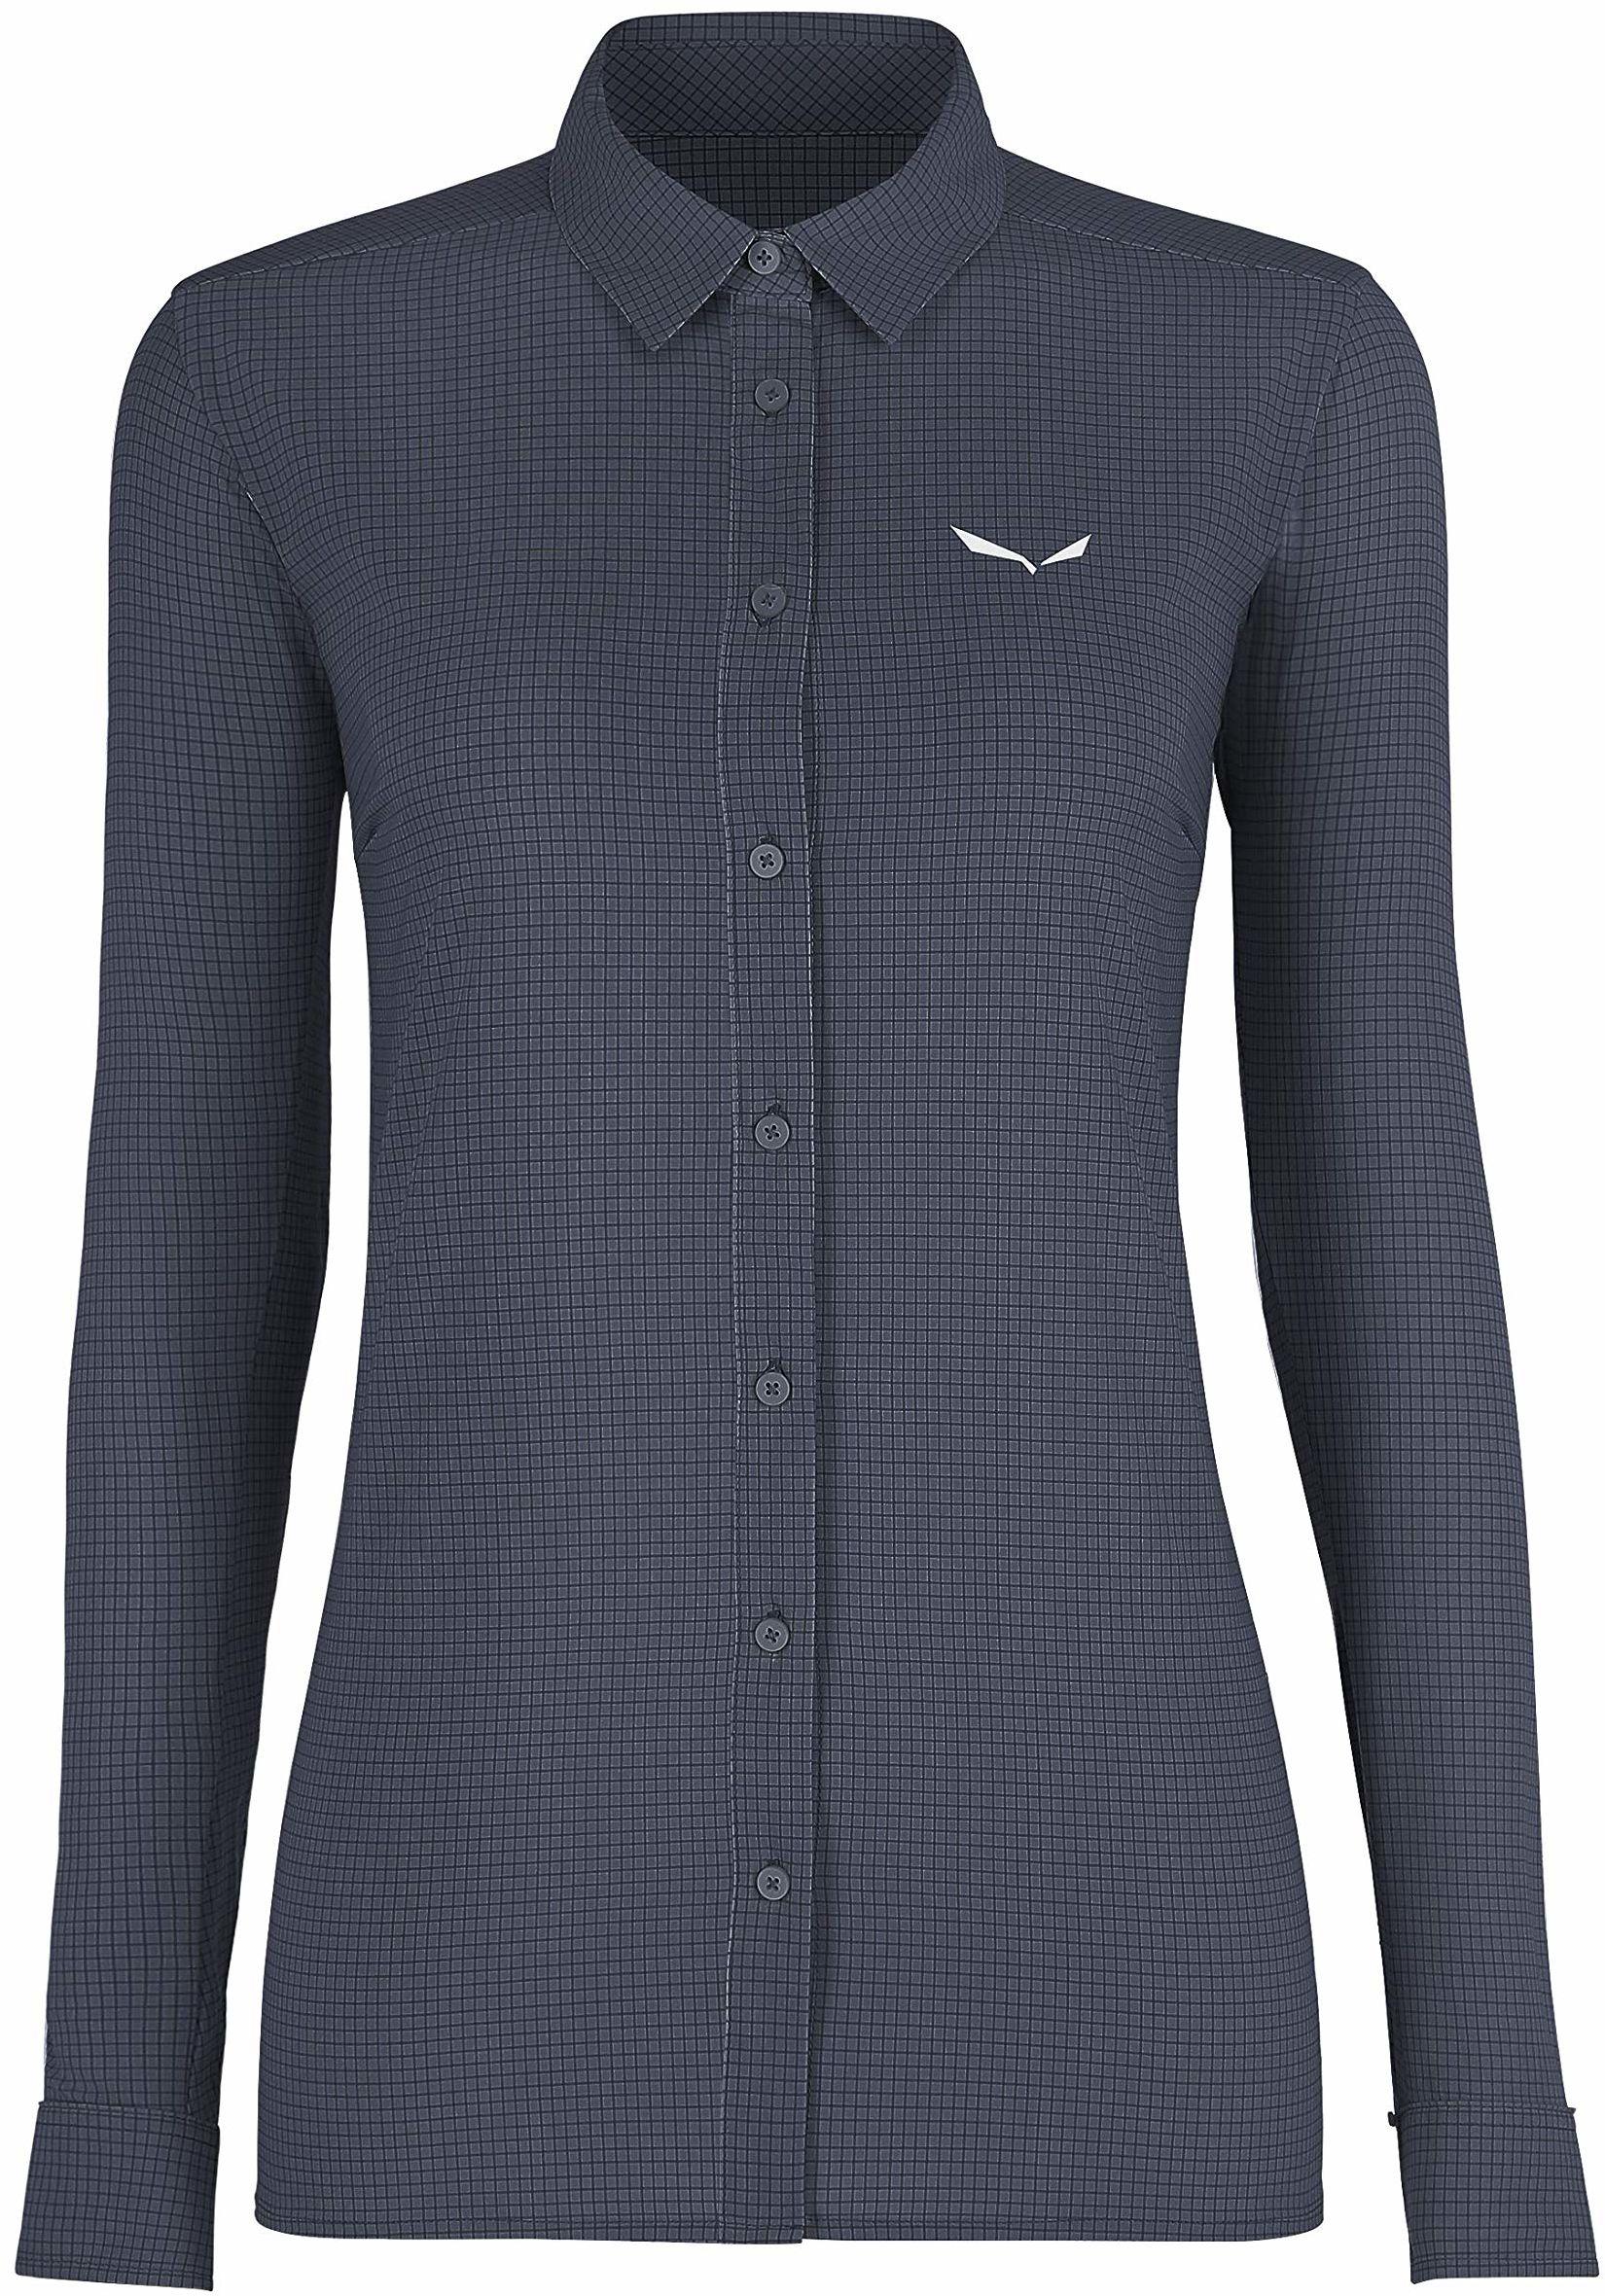 Salewa Puez Minicheck2 Dry W L/S SRT bluzki i T-shirty, Ombre Blue, 44/38